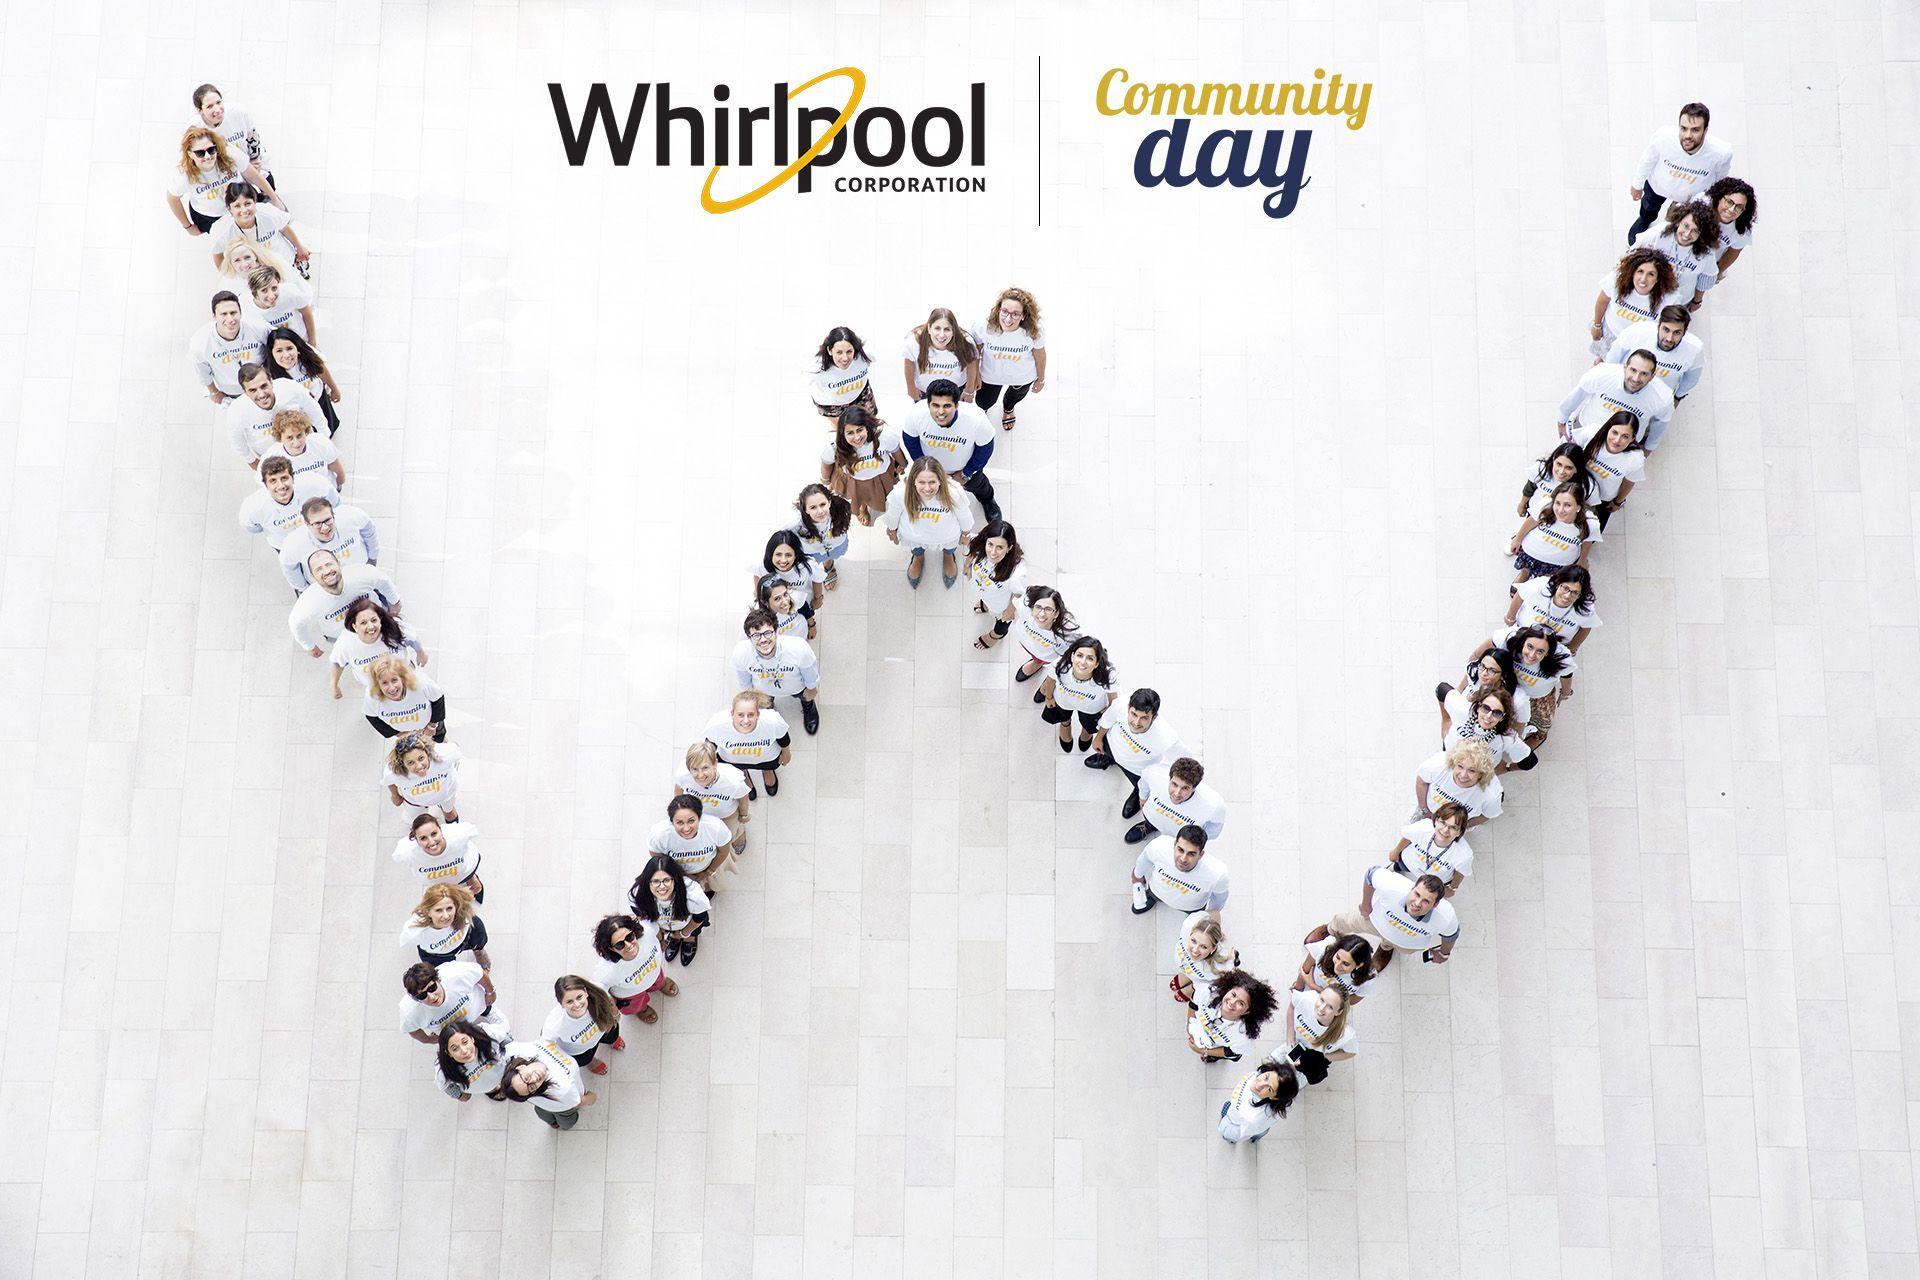 Whirlpool EMEA Community Day 2018